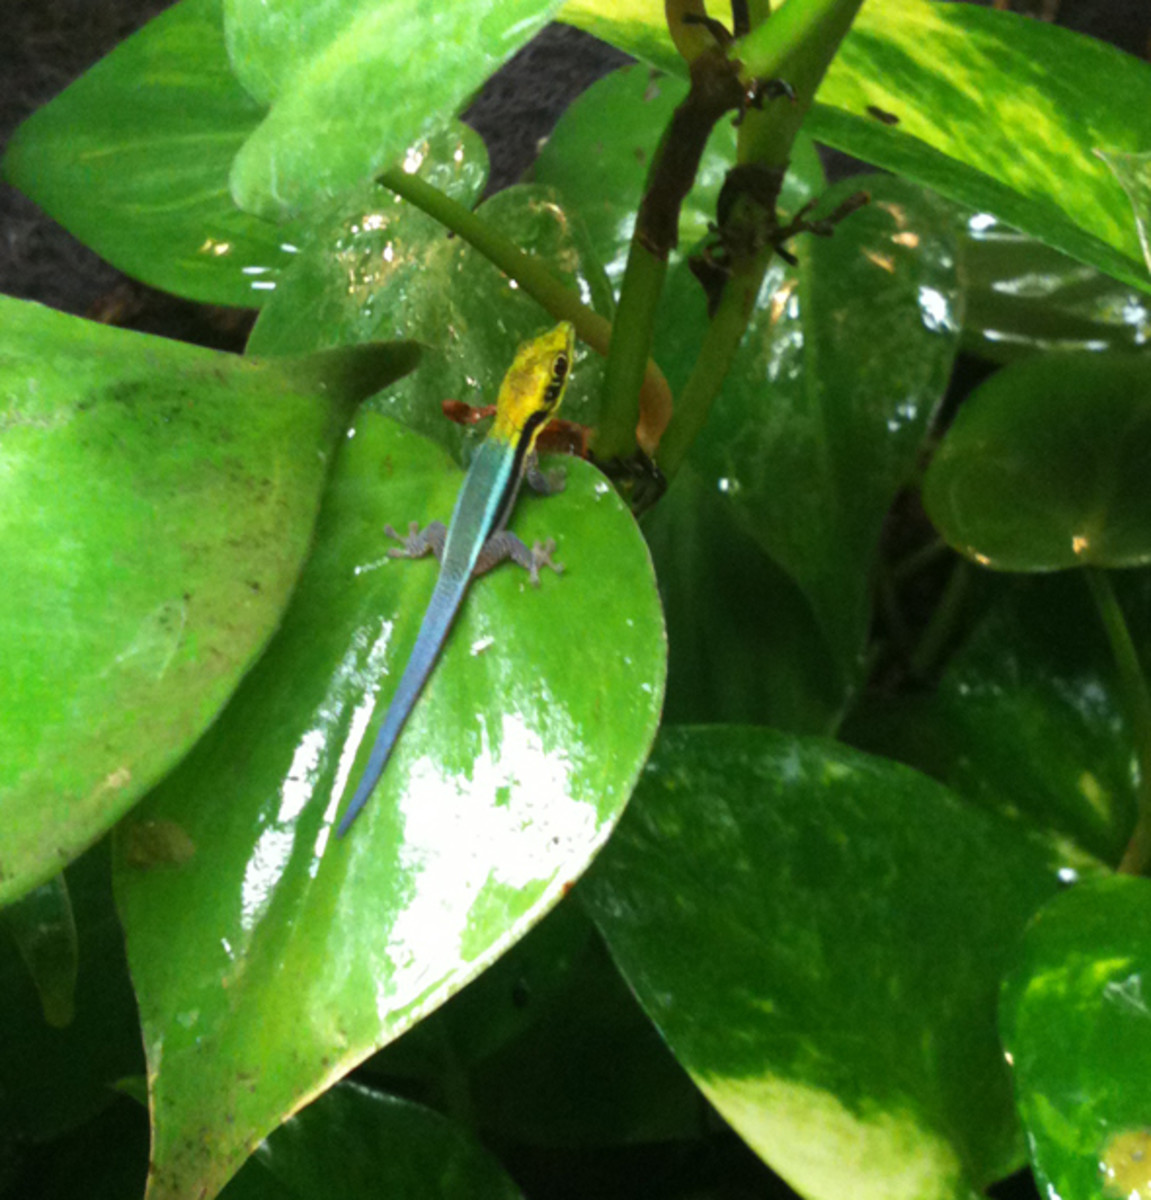 Day geckos appreciate live plants in their enclosures